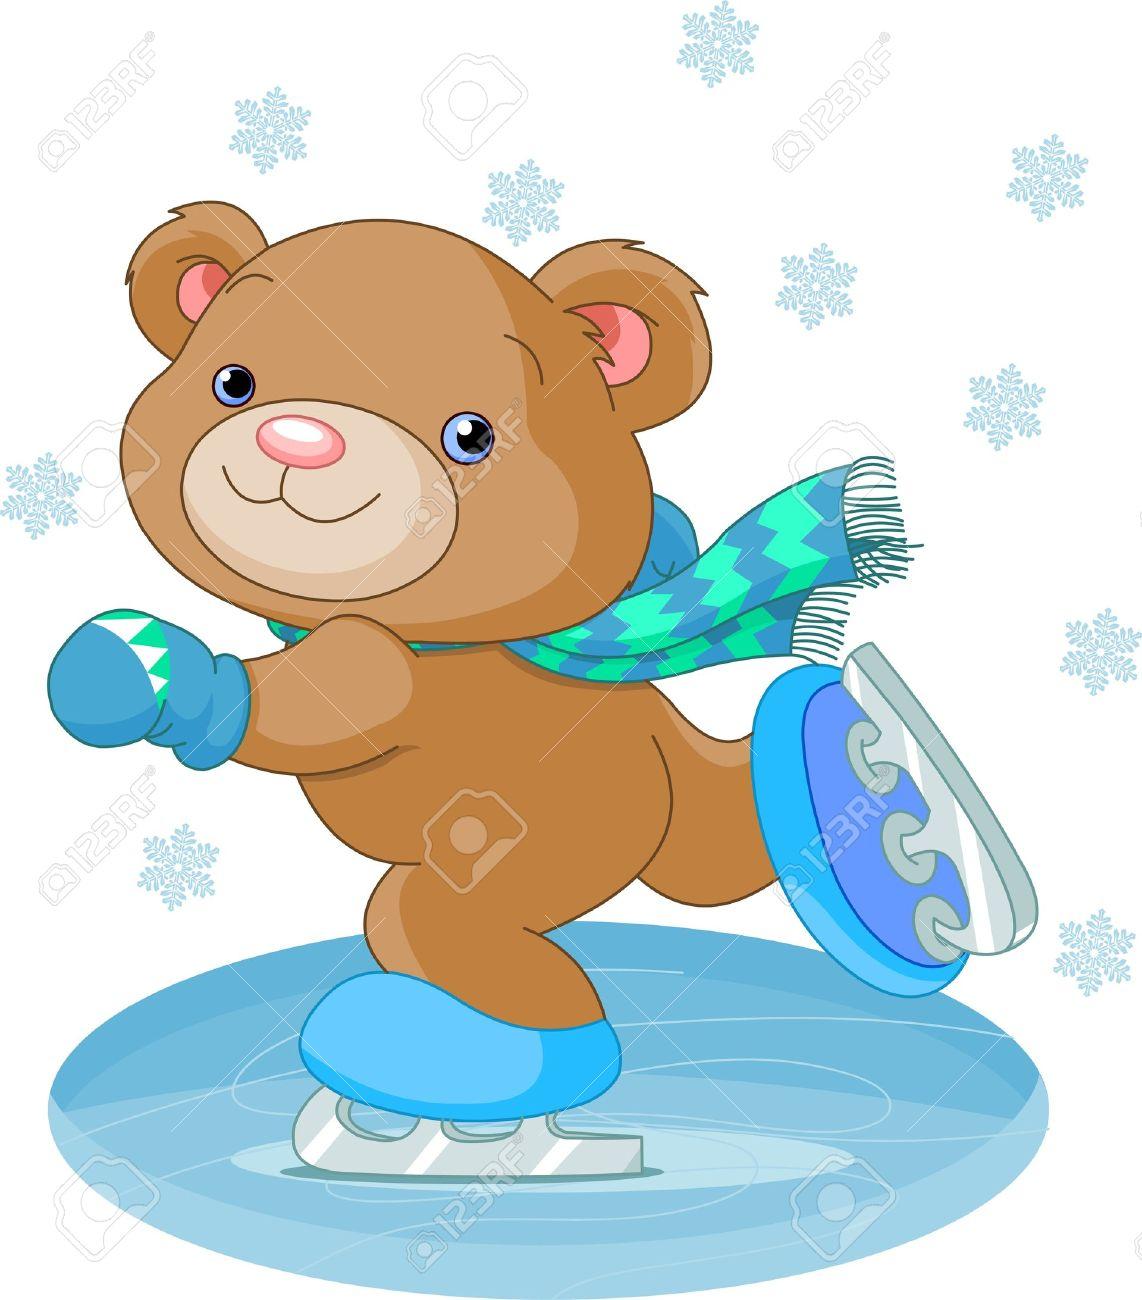 Illustration of cute bear on ice skates Stock Vector - 11844700